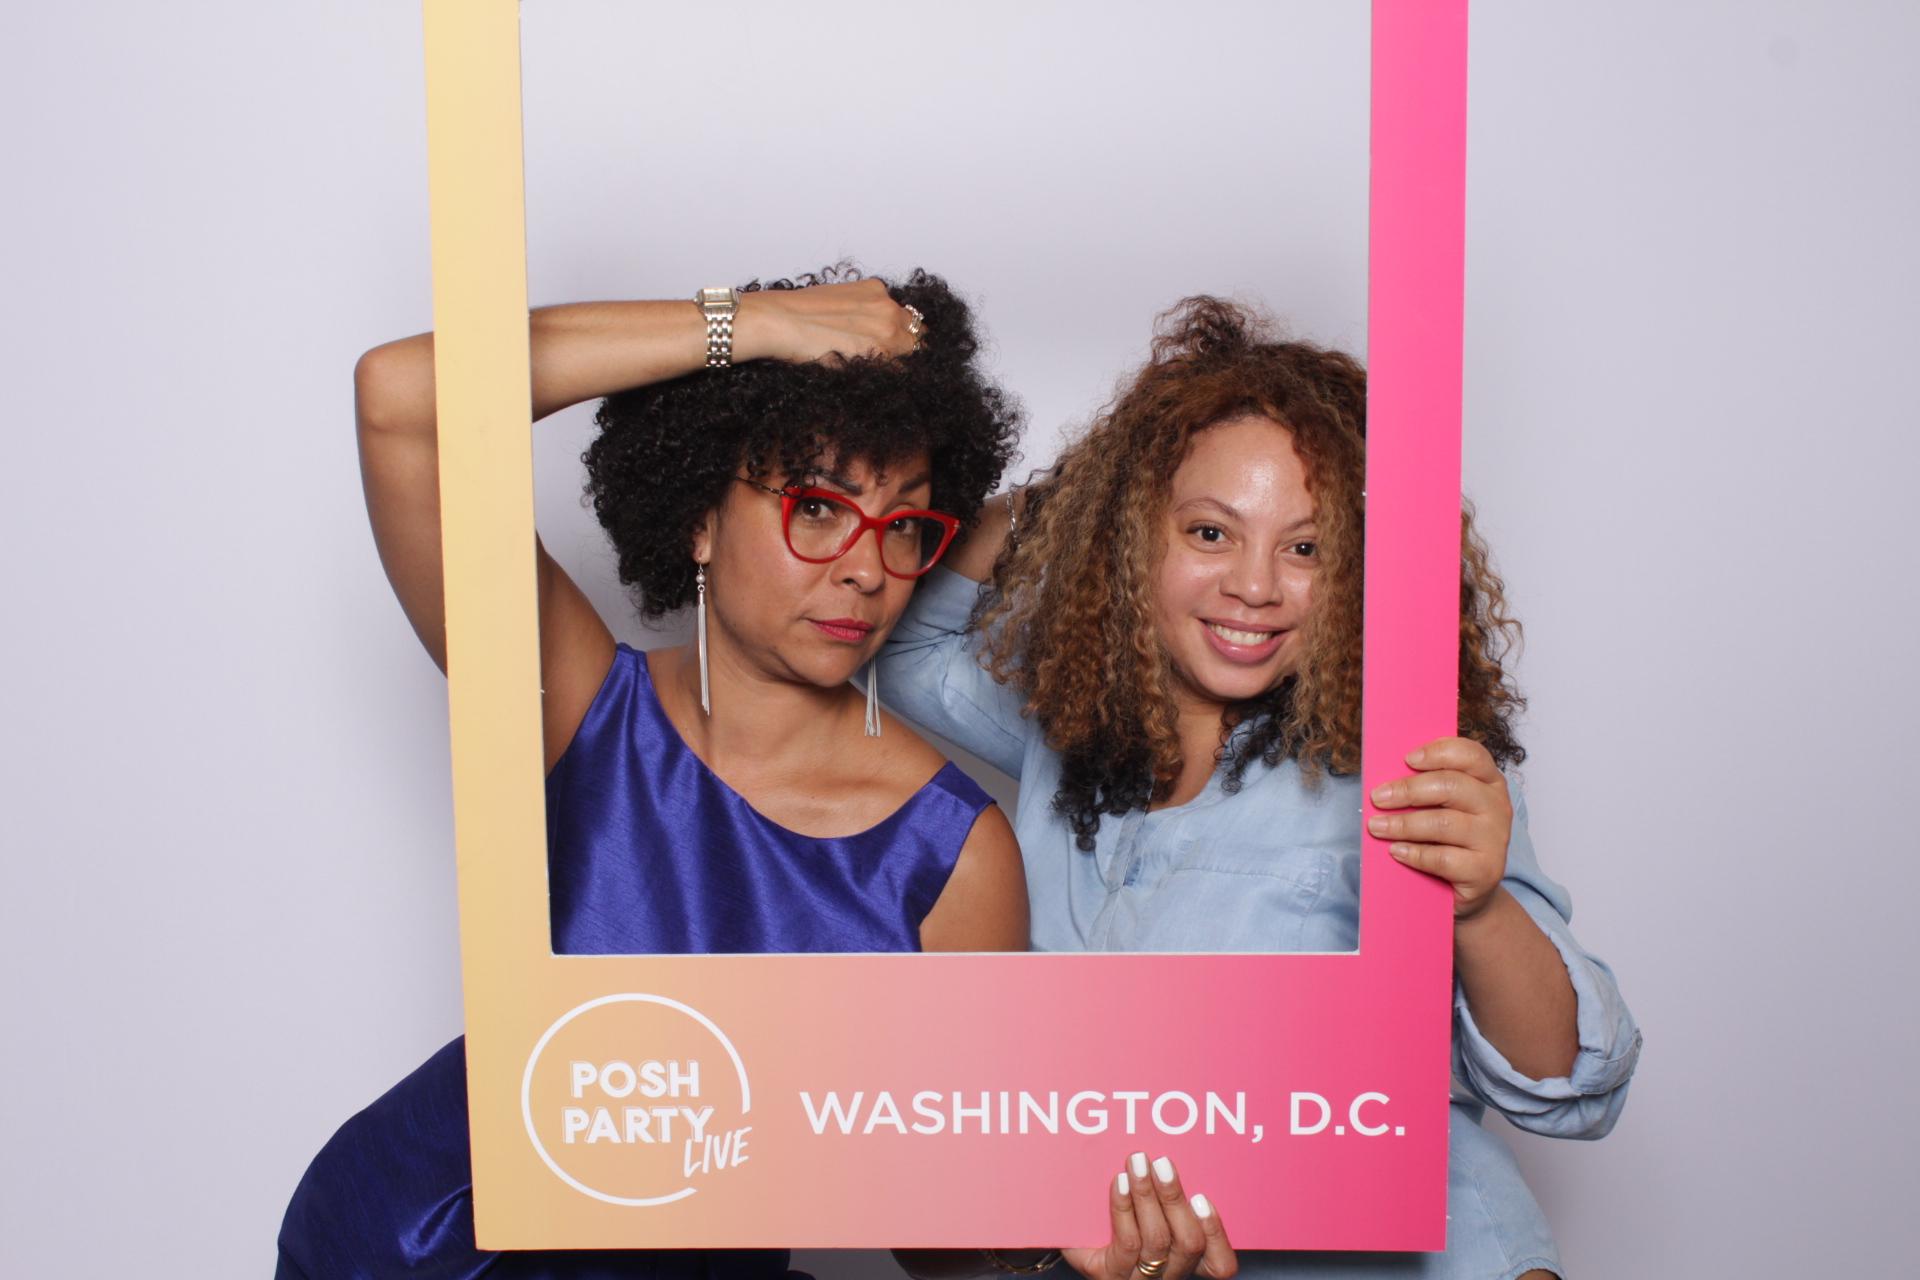 #PoshPartyLive DC 2019 - The Mayflower Hotel, Washington D.C.05/23/2019